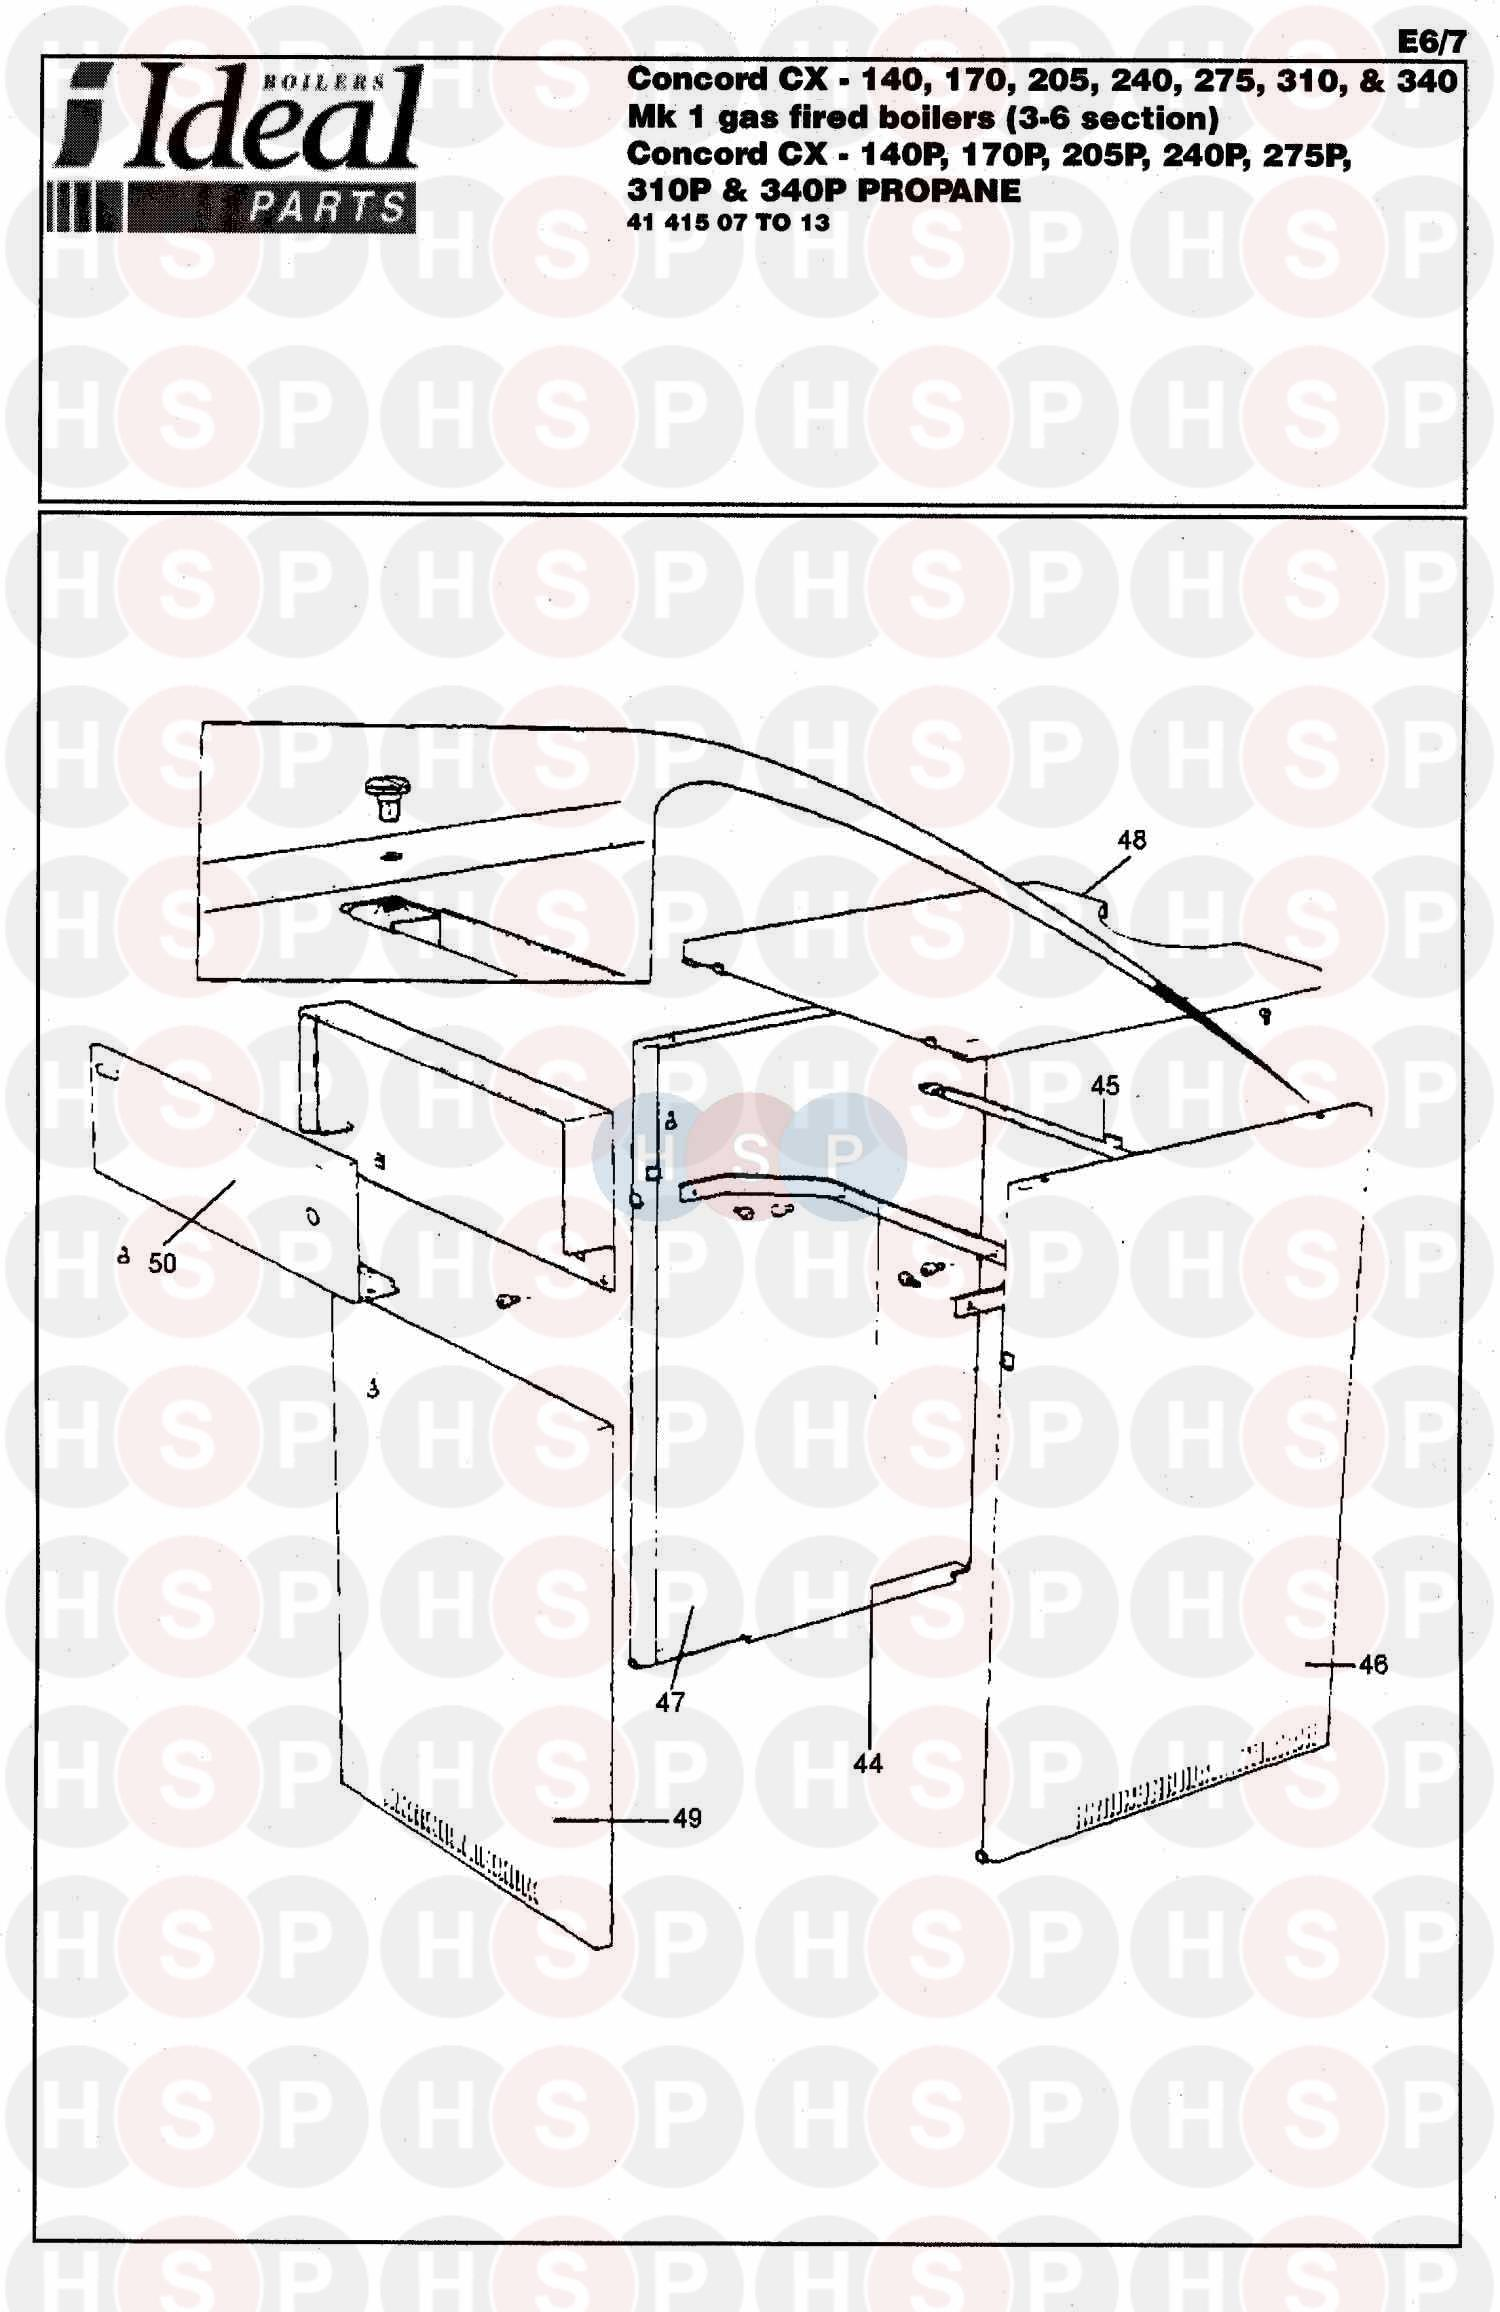 ideal concord cx 140 140p boiler casing diagram. Black Bedroom Furniture Sets. Home Design Ideas